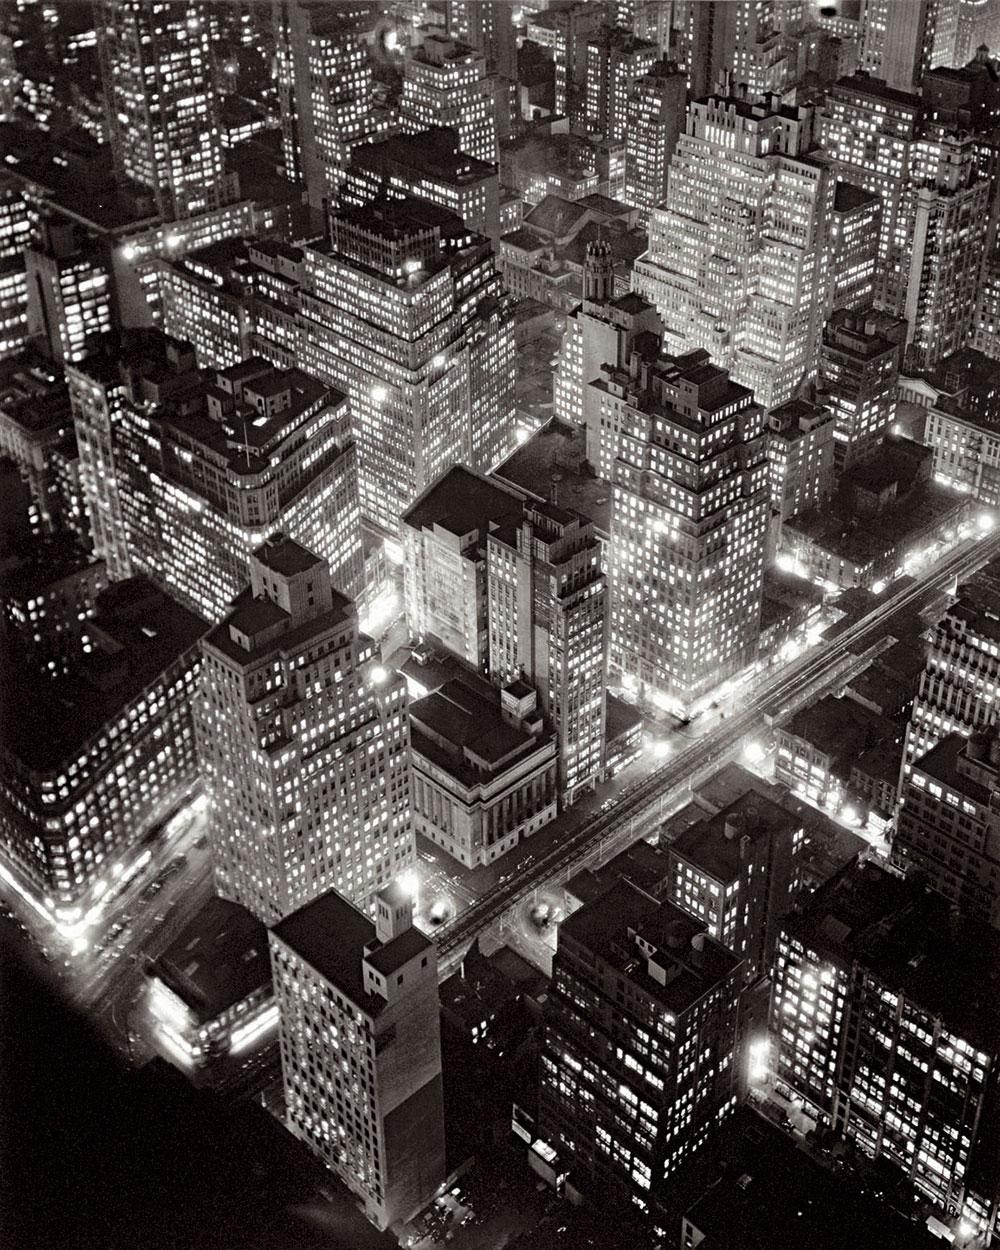 Berenice Abbott. Vista aérea de Nueva York de noche, 20 de marzo de 1936. International Center of Photography. © Getty Images/Berenice Abbott